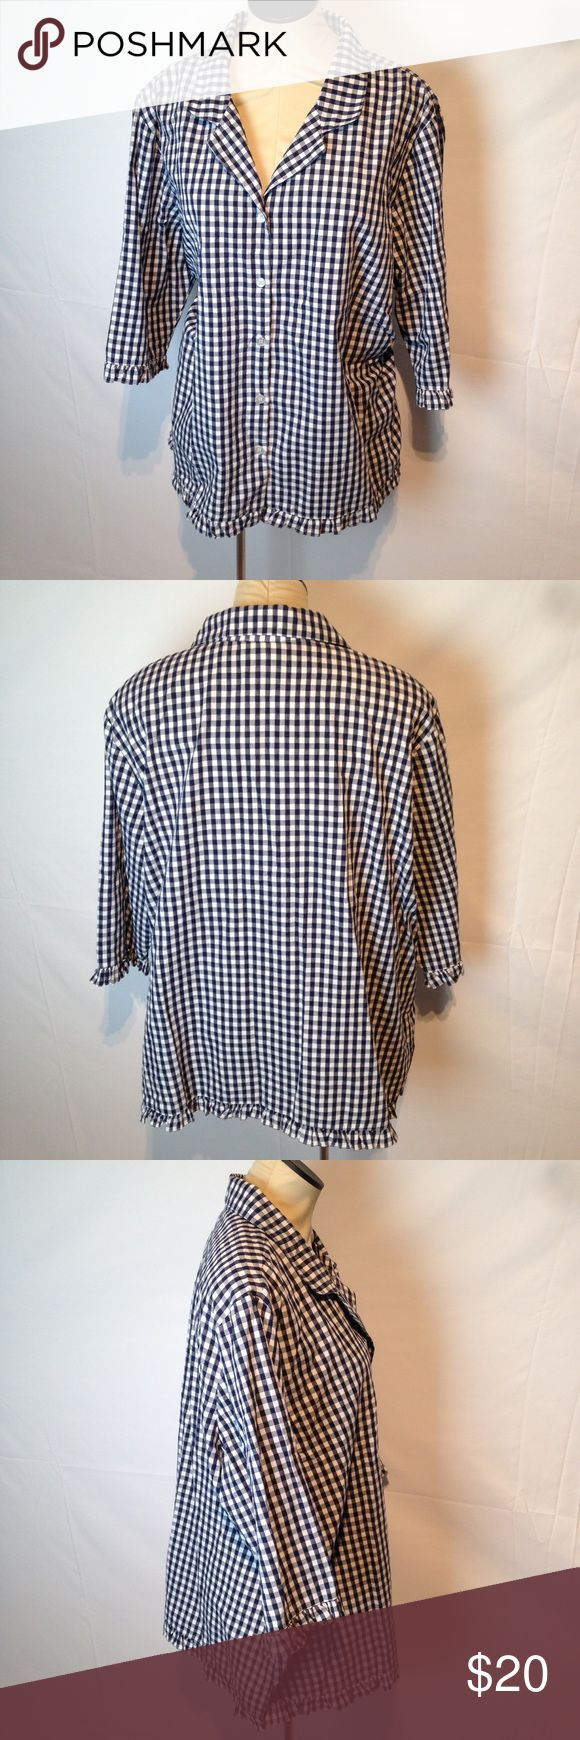 Blue gingham button down shirt Super cute blue gingham shirt with ruffle trim. D. & Co.  Tops Button Down Shirts